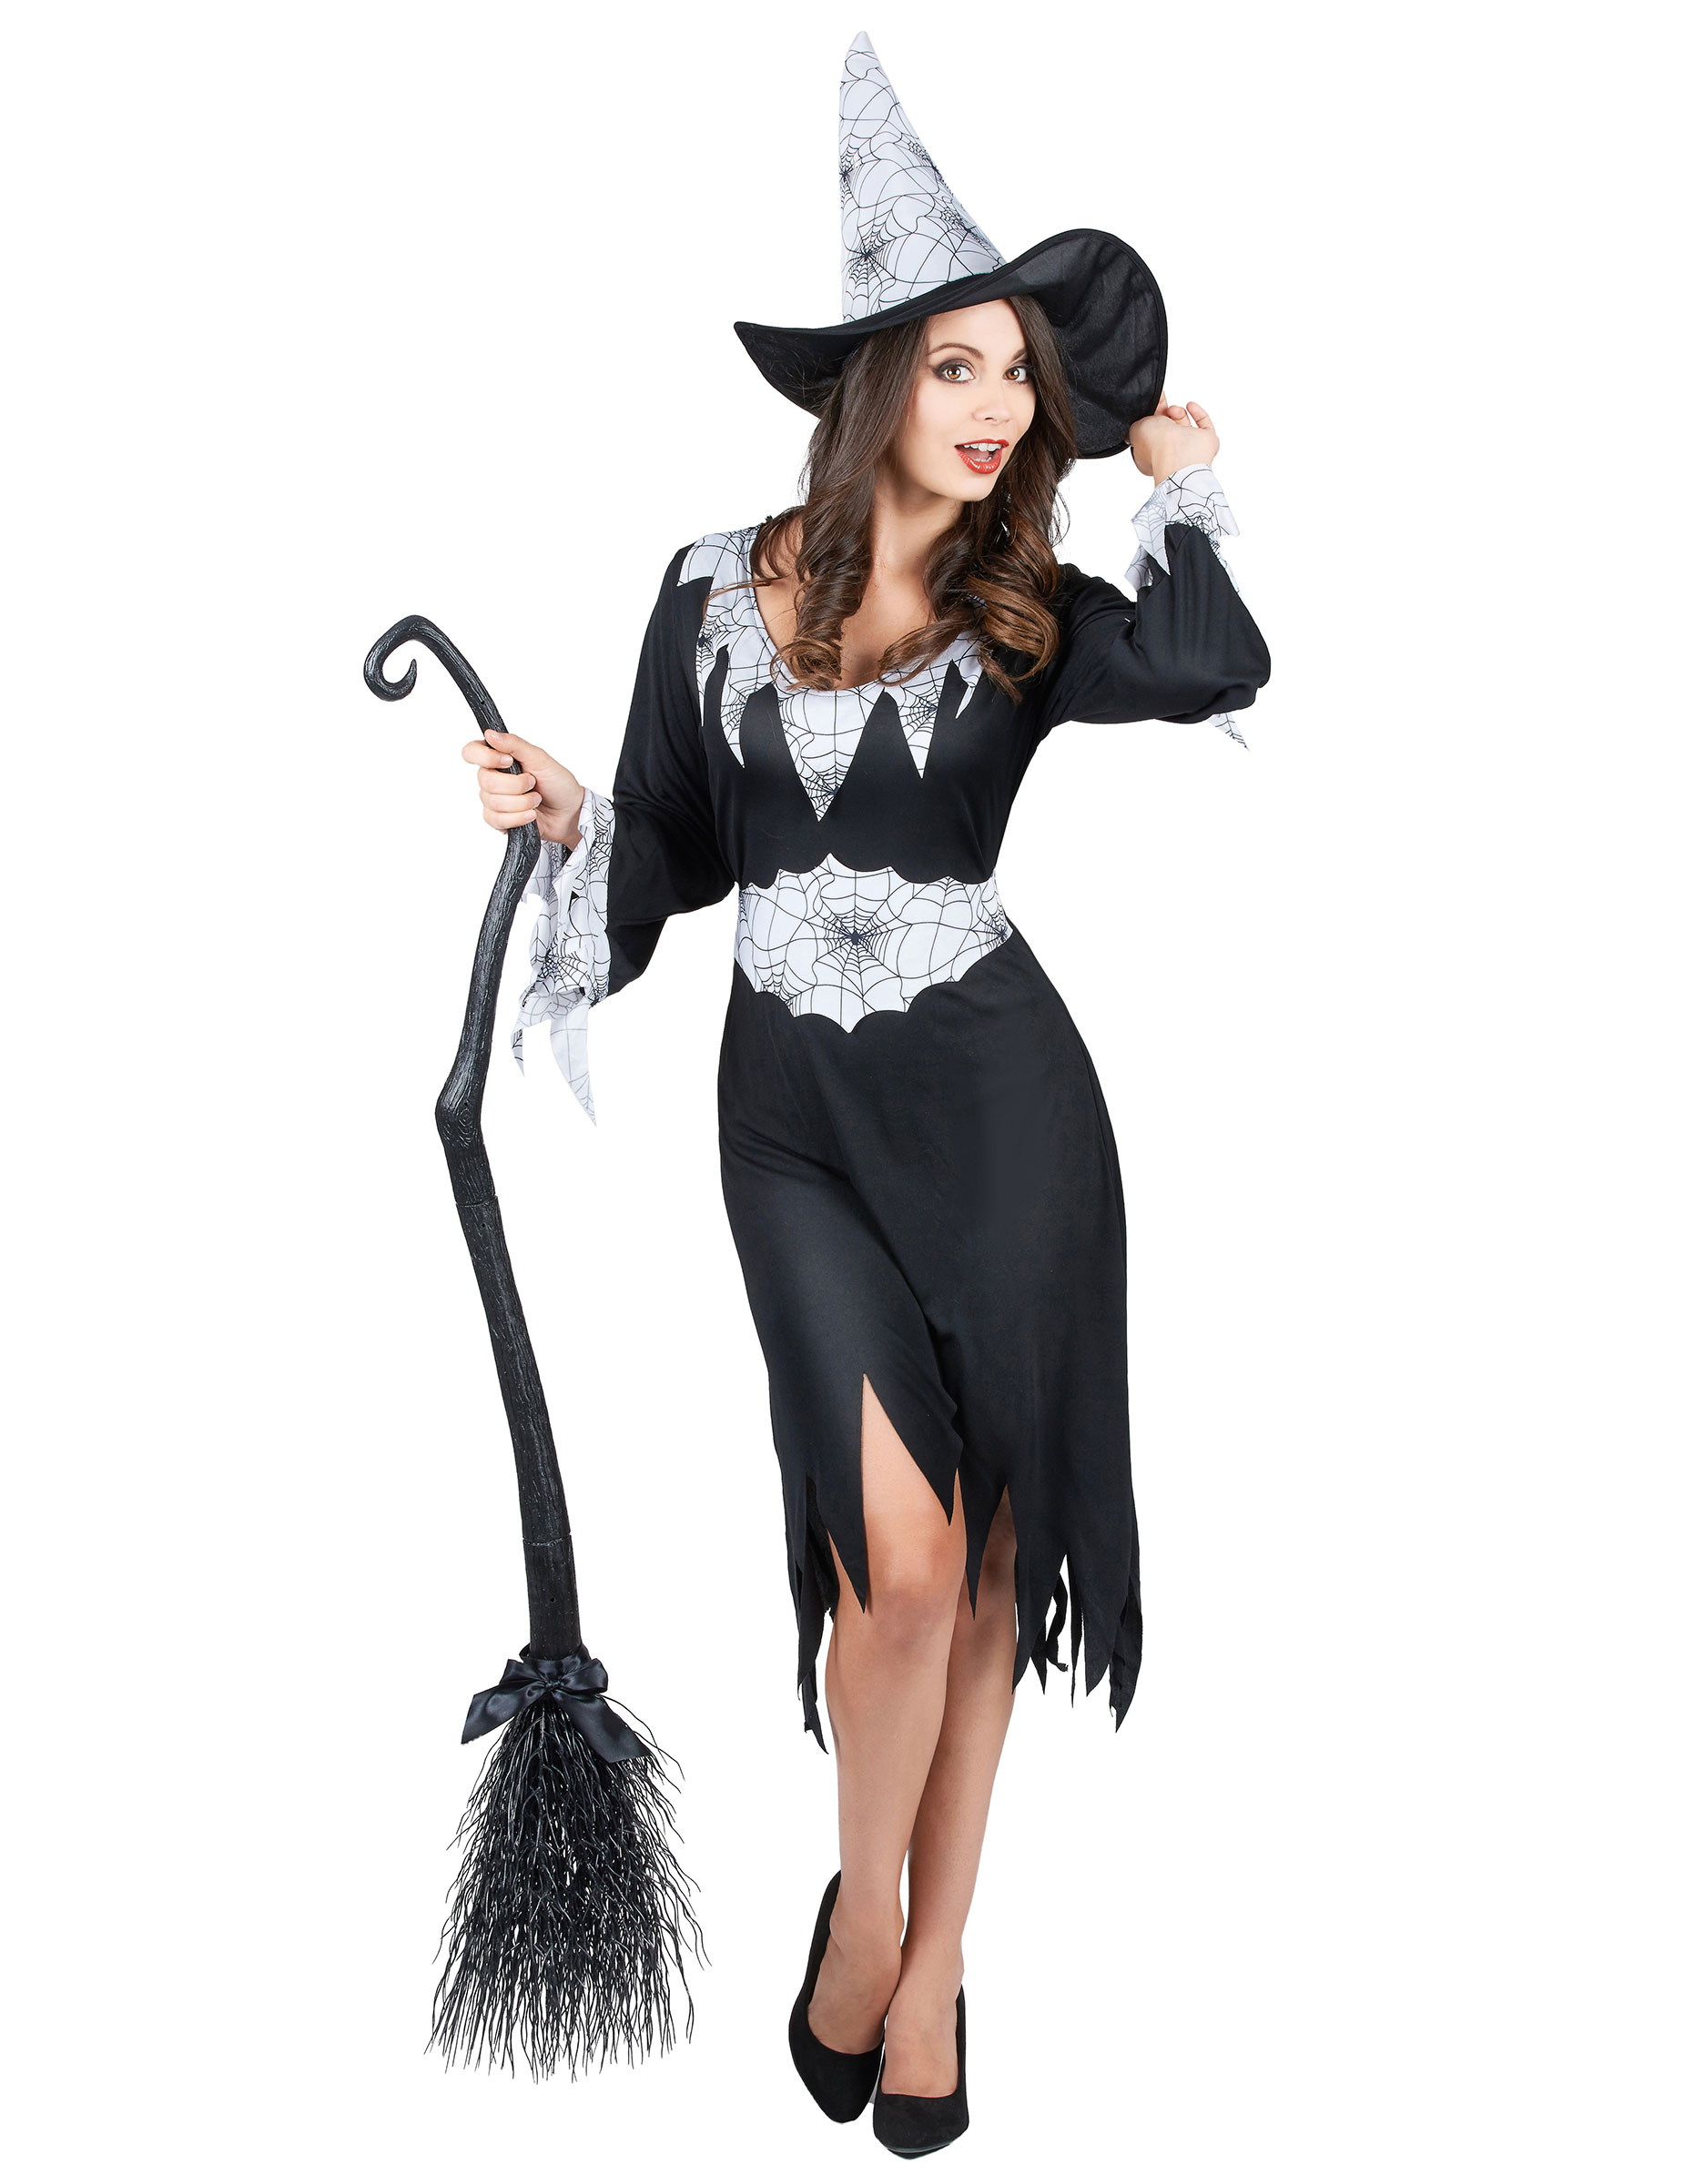 elegante spinnen hexe damenkost m schwarz weiss g nstige faschings kost me bei karneval megastore. Black Bedroom Furniture Sets. Home Design Ideas